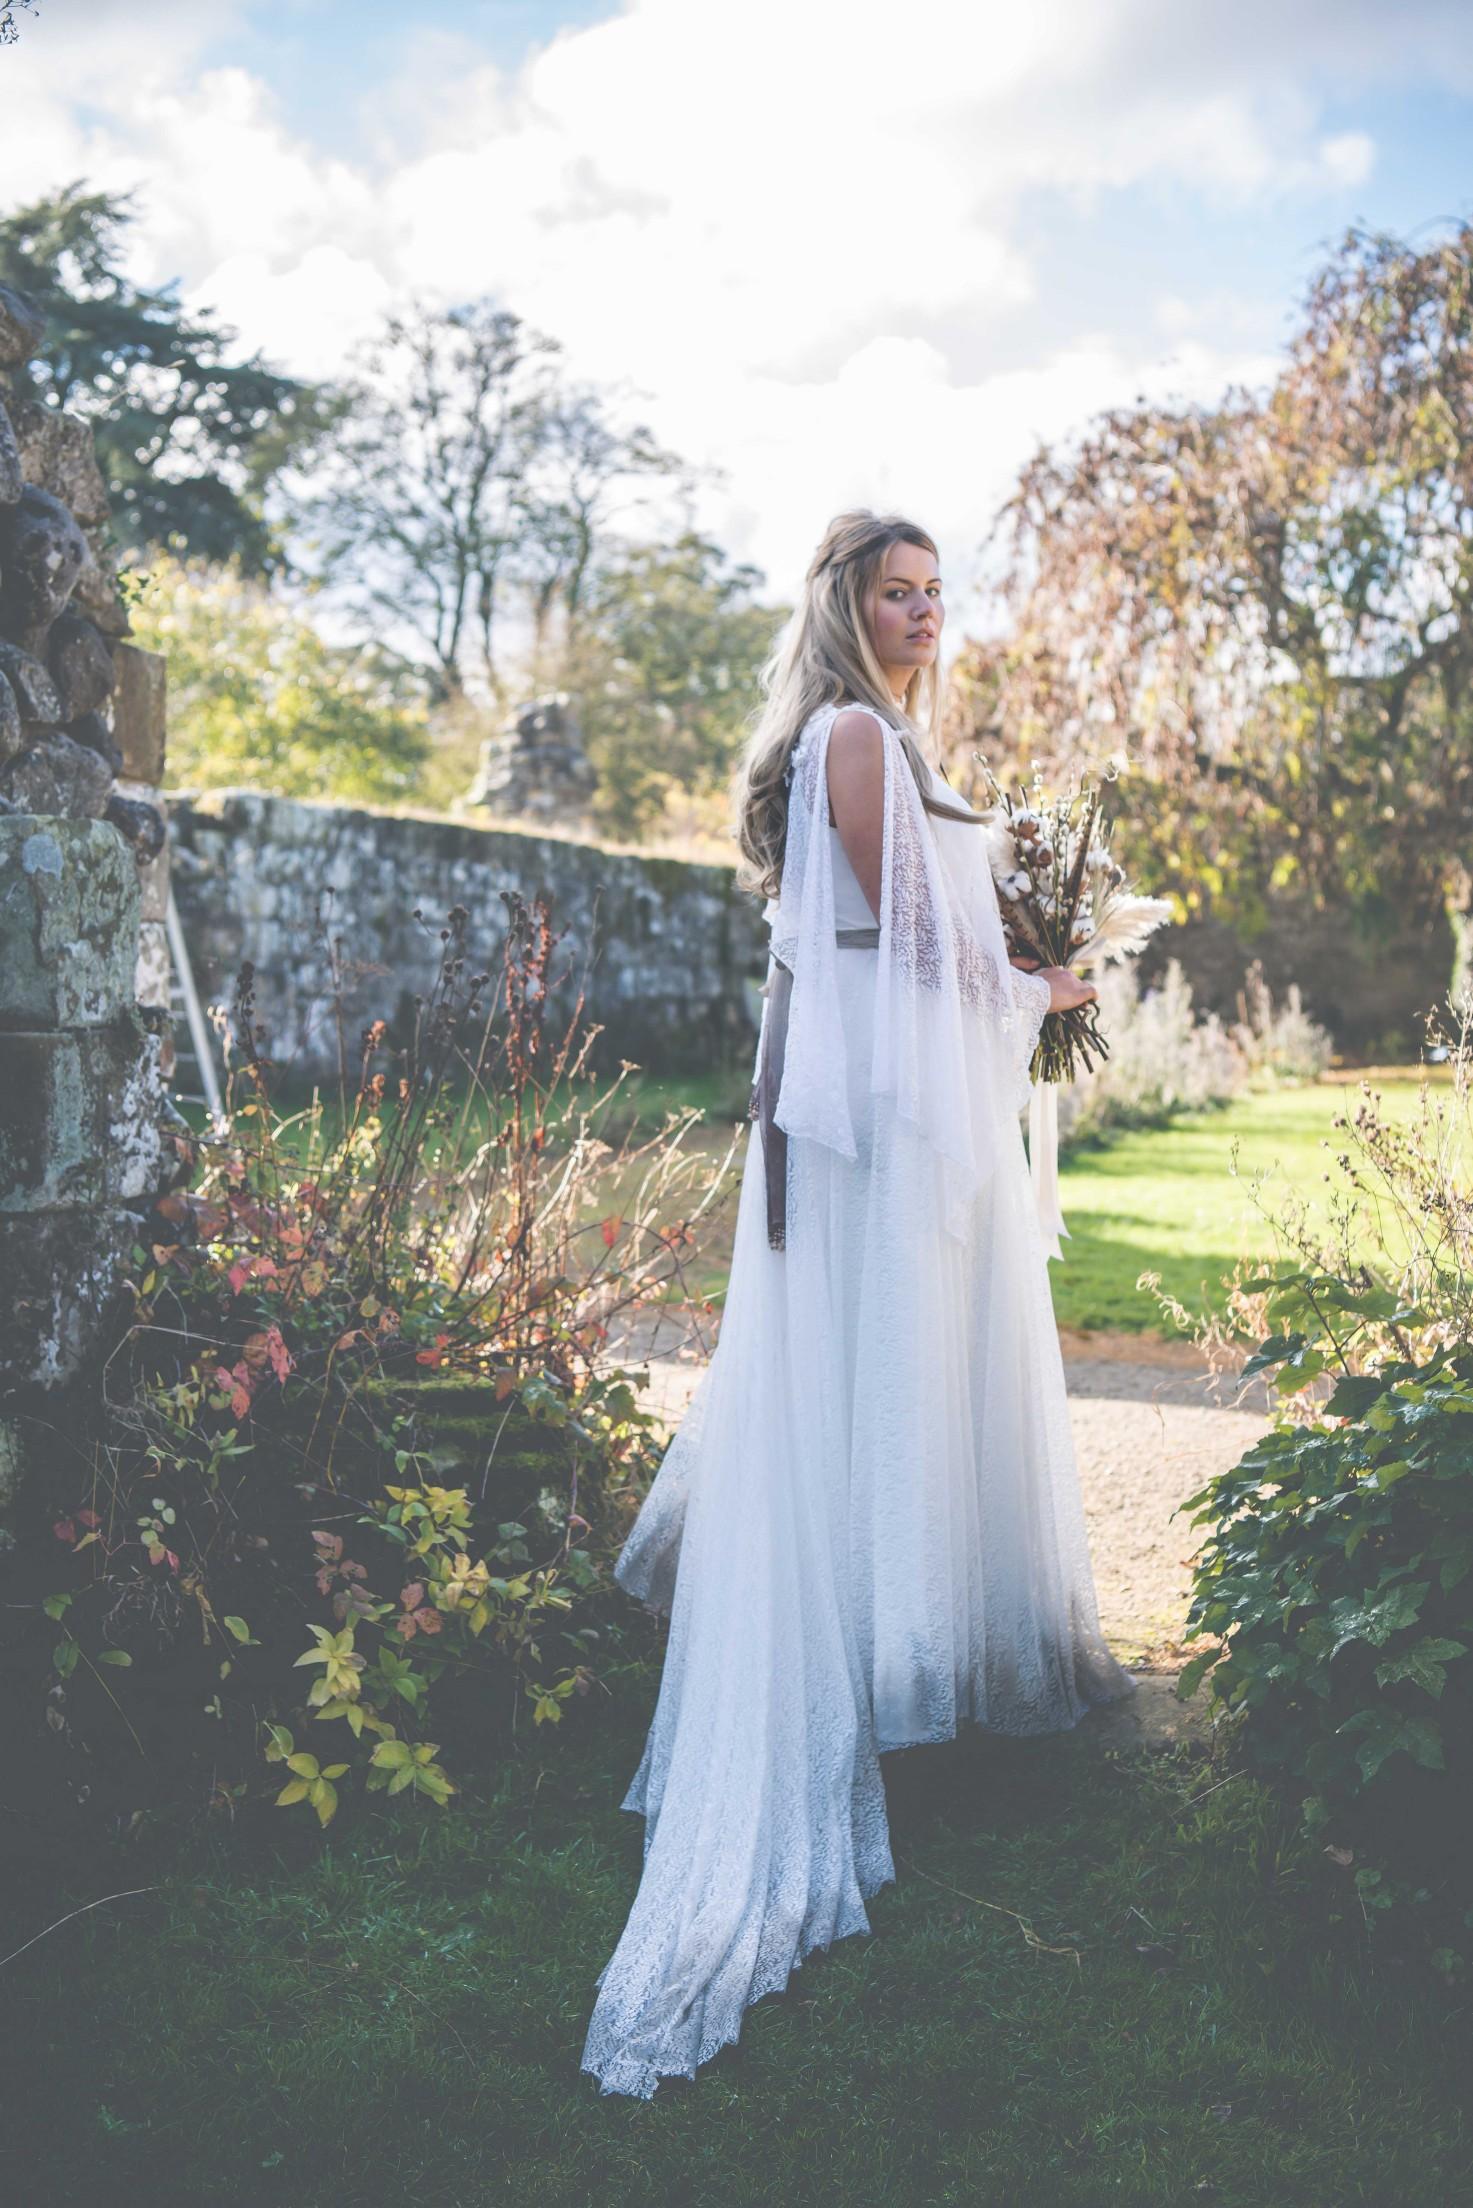 Live your own fairytale wedding - BexBrides - Jervaulx-0018 [9664] (2)